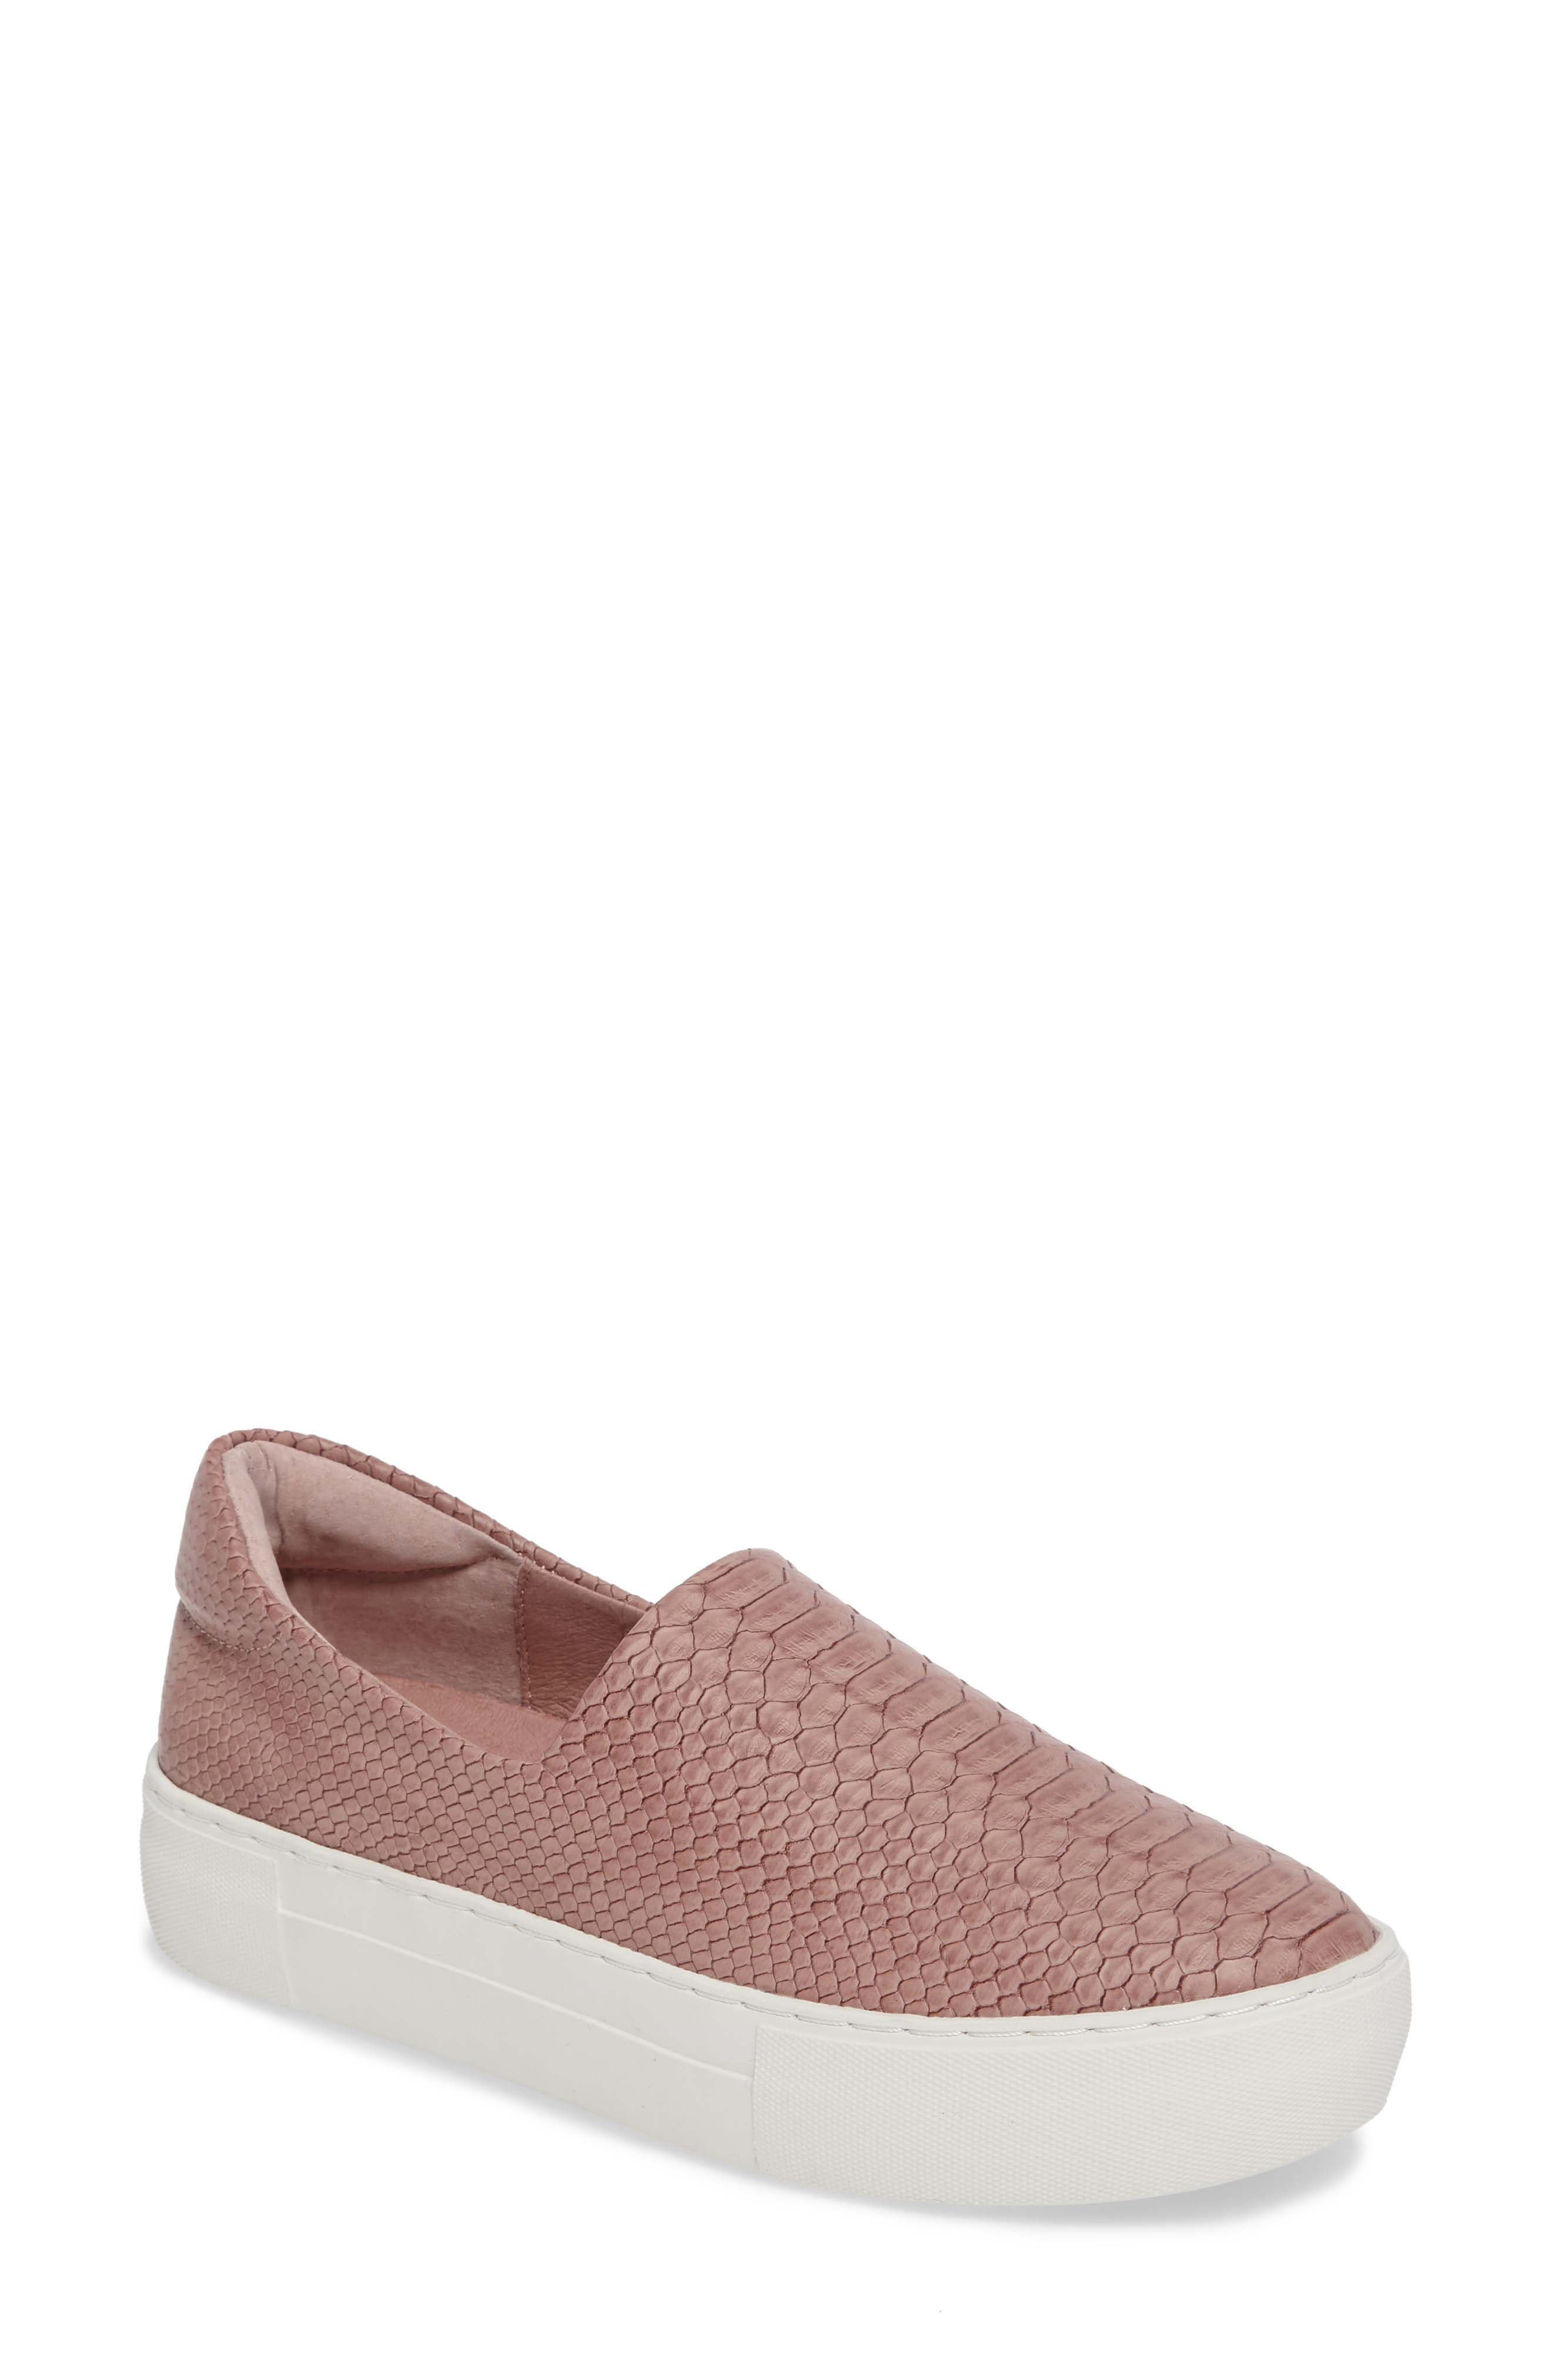 Alternate Image 1 Selected - JSlides 'Ariana' Platform Sneaker (Women)